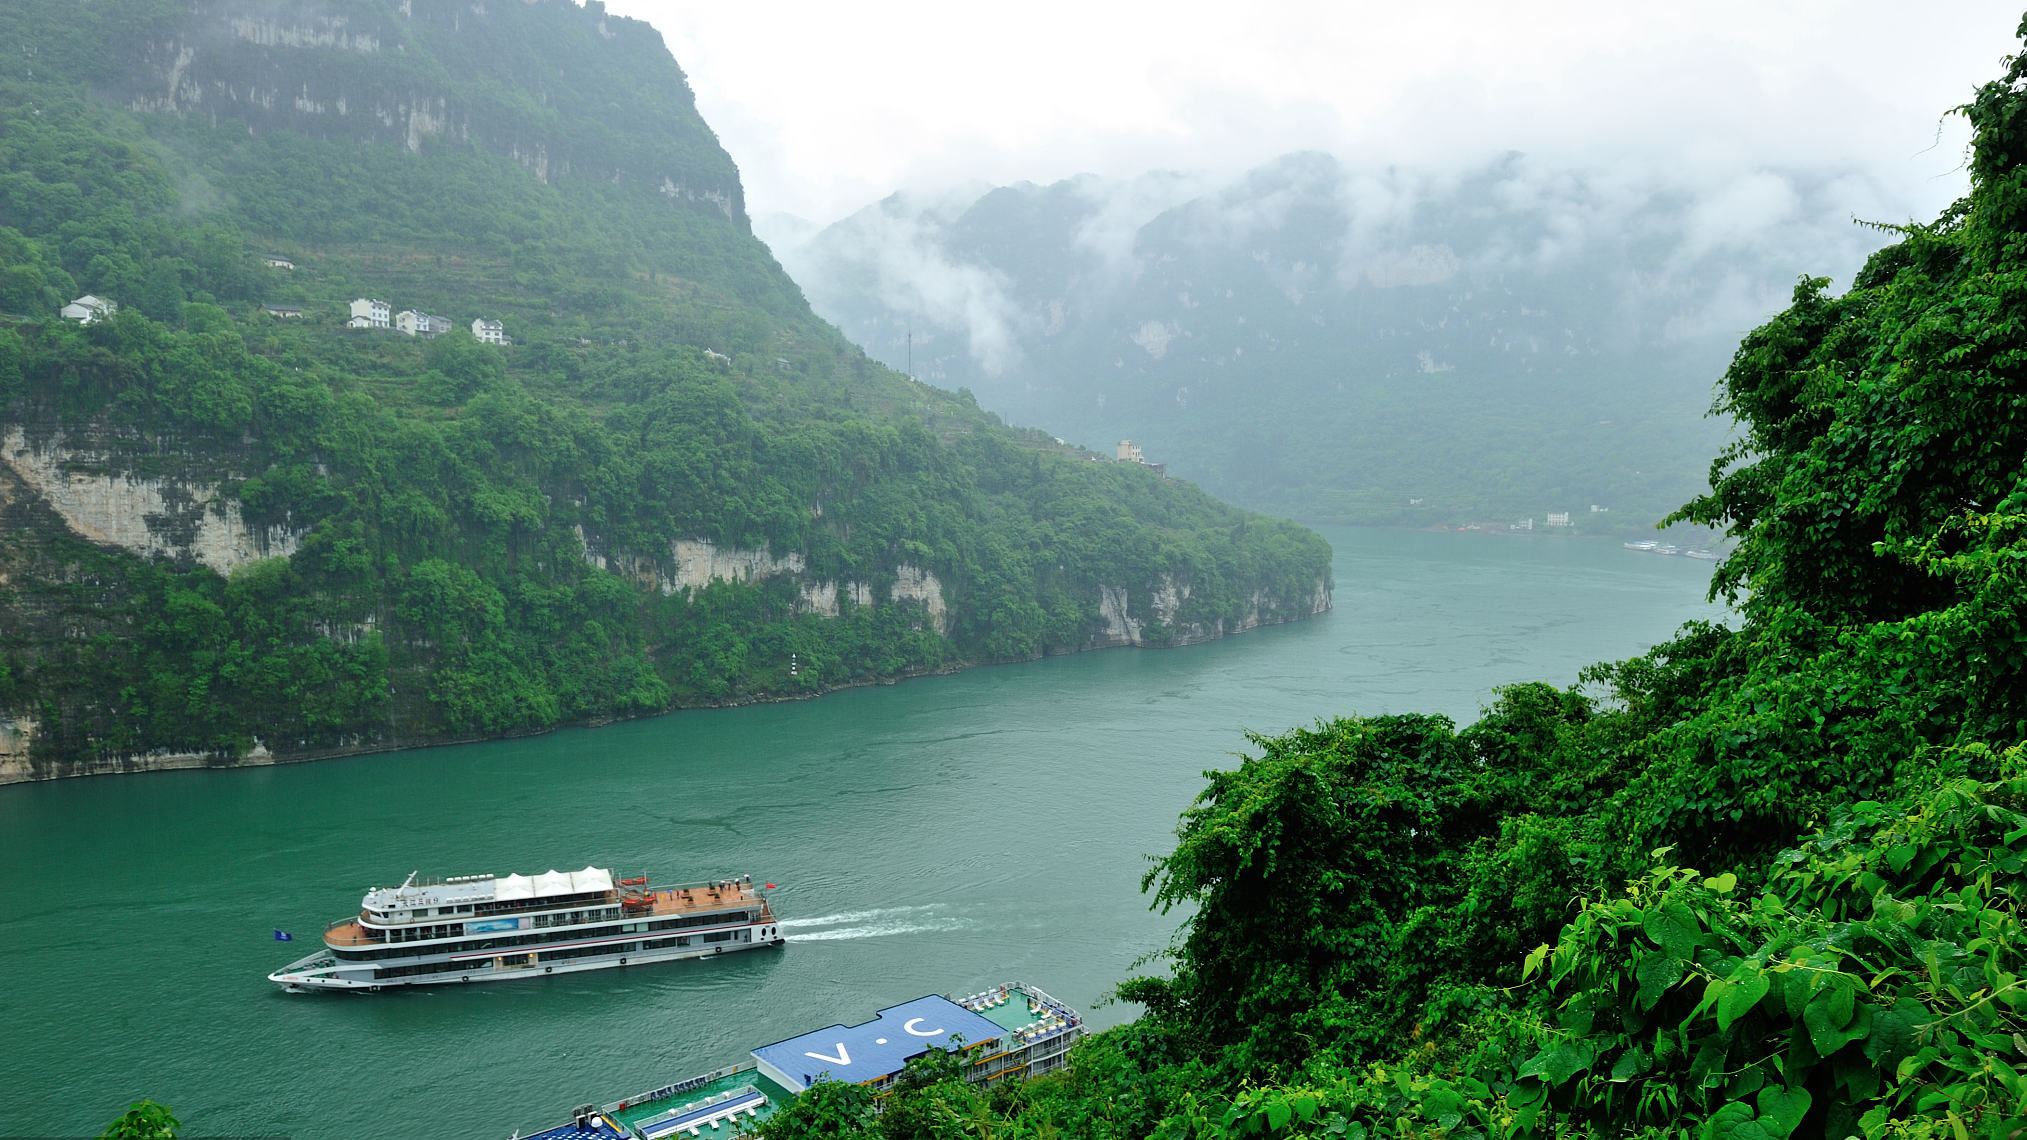 Chinese vice premier stresses high-quality development of Yangtze economic belt